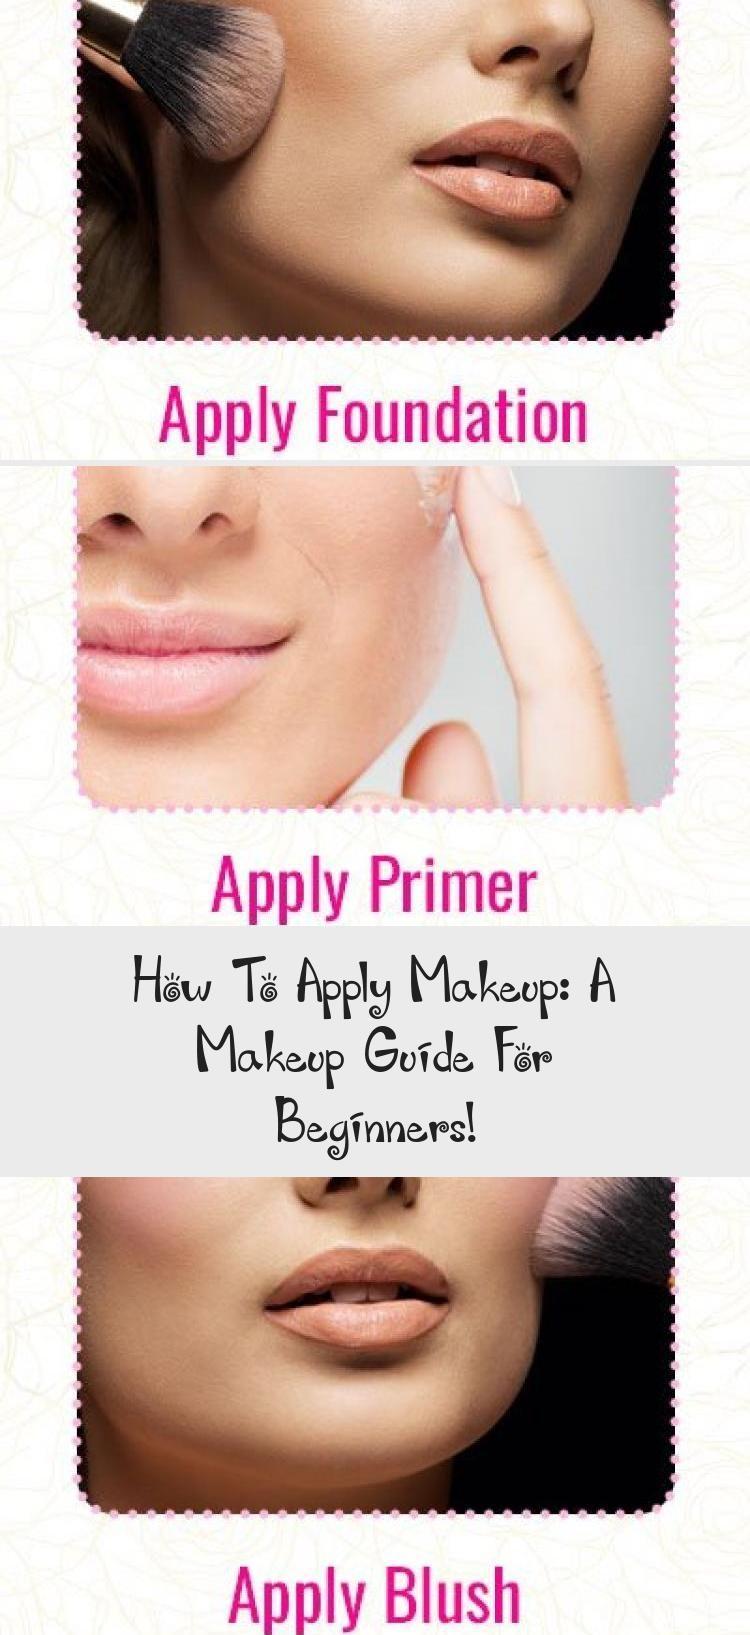 Photo of #HowToApplyMakeup: A Makeup Guide For Beginners! #makeuptutorialVideos #Summerma…